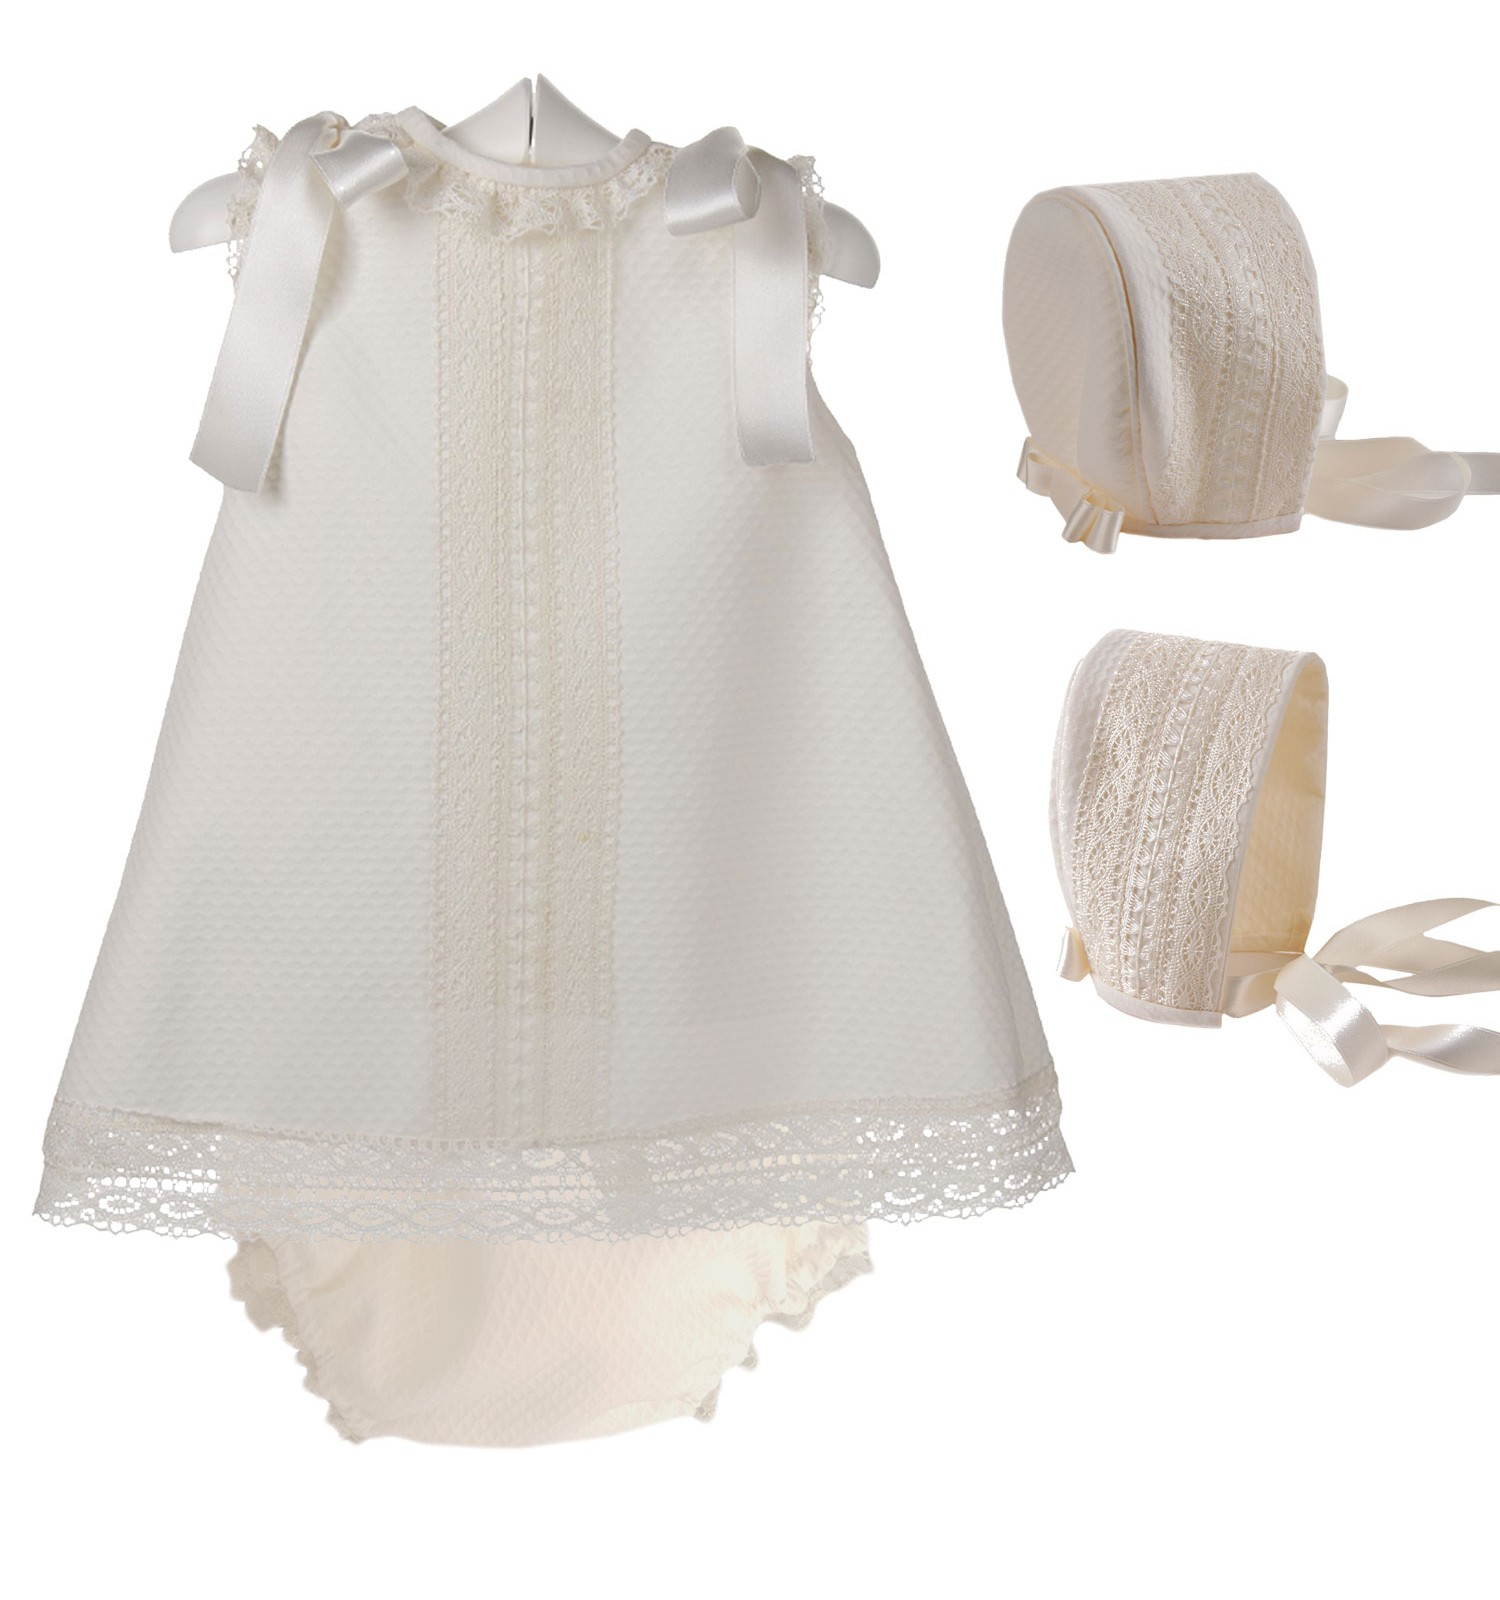 Conjunto vestido, braguita y capota de piqué para bebé de piqué con entredoses de bolillo